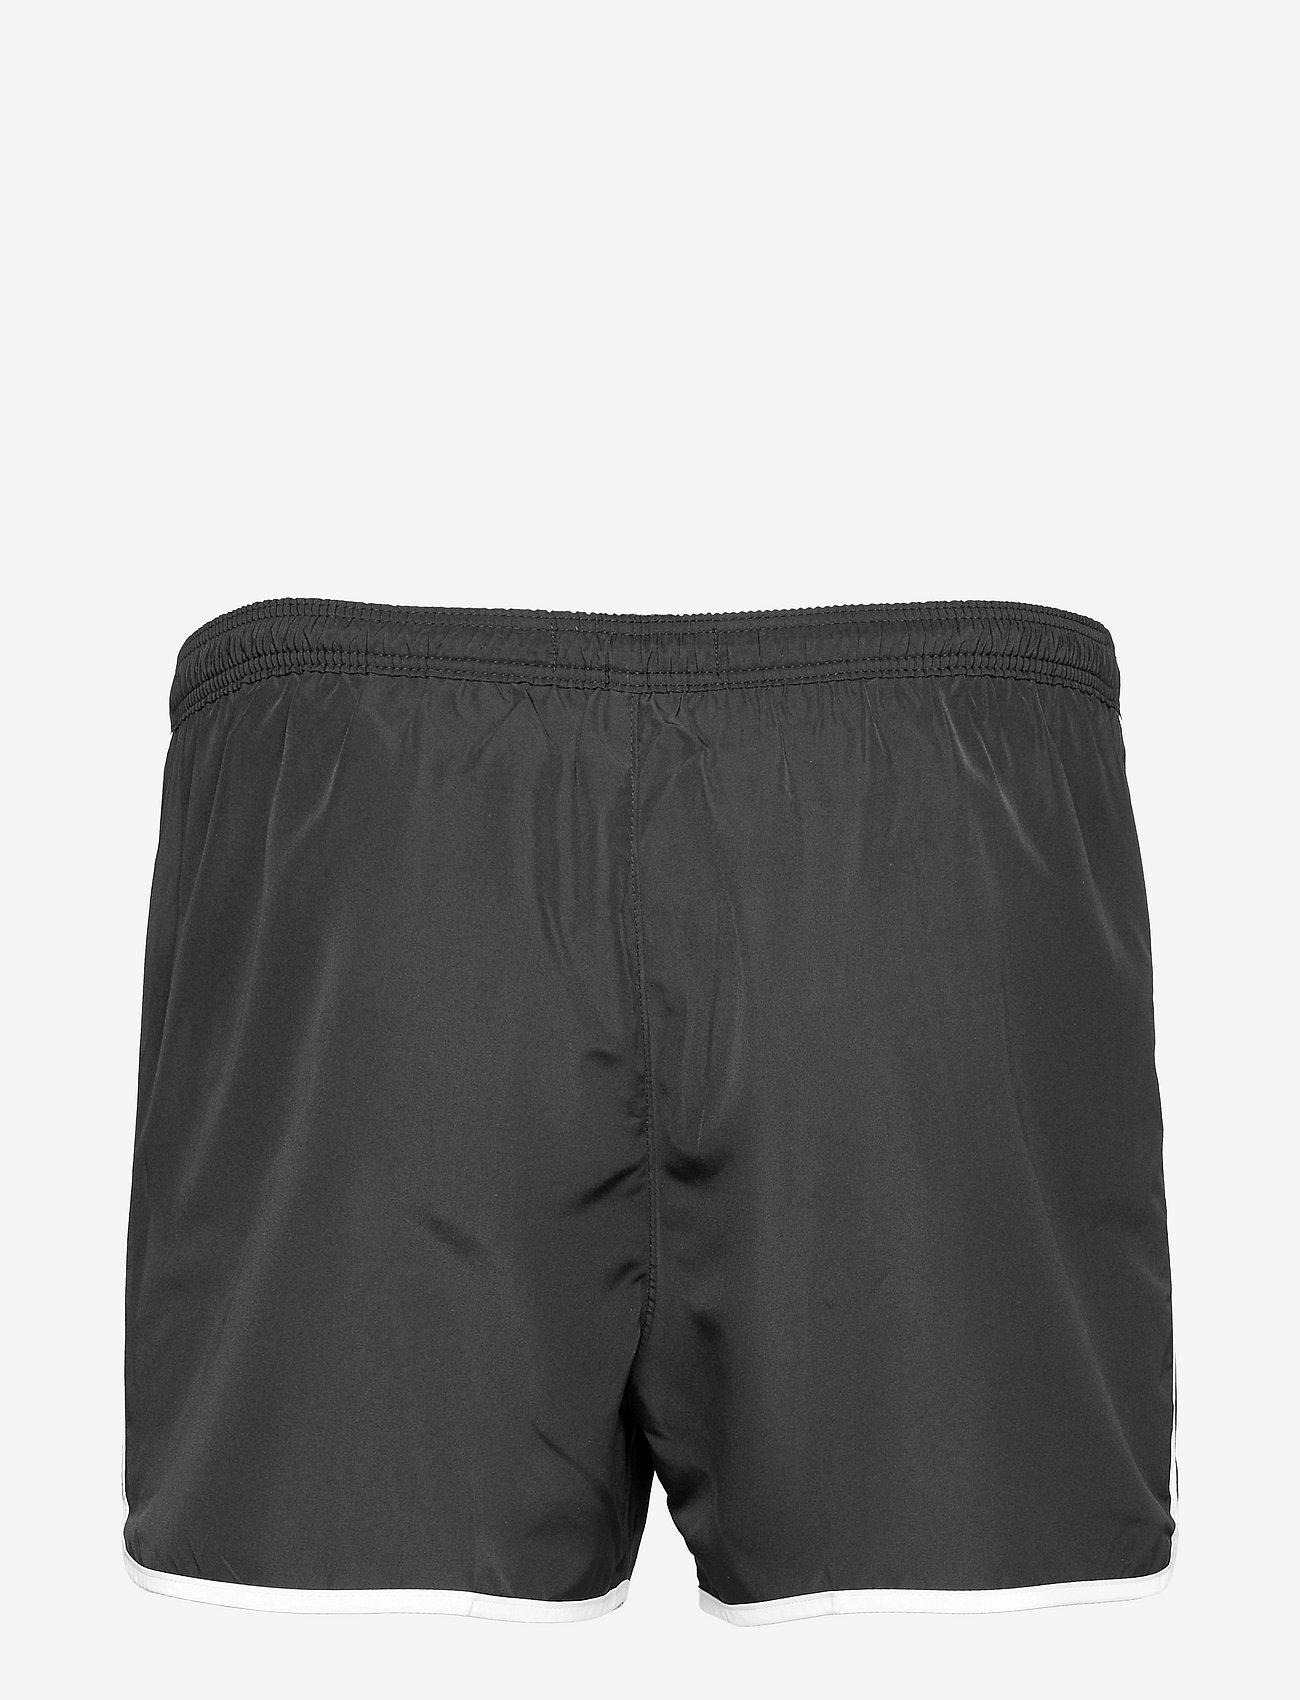 Calvin Klein - SHORT RUNNER - shorts - pvh black - 1